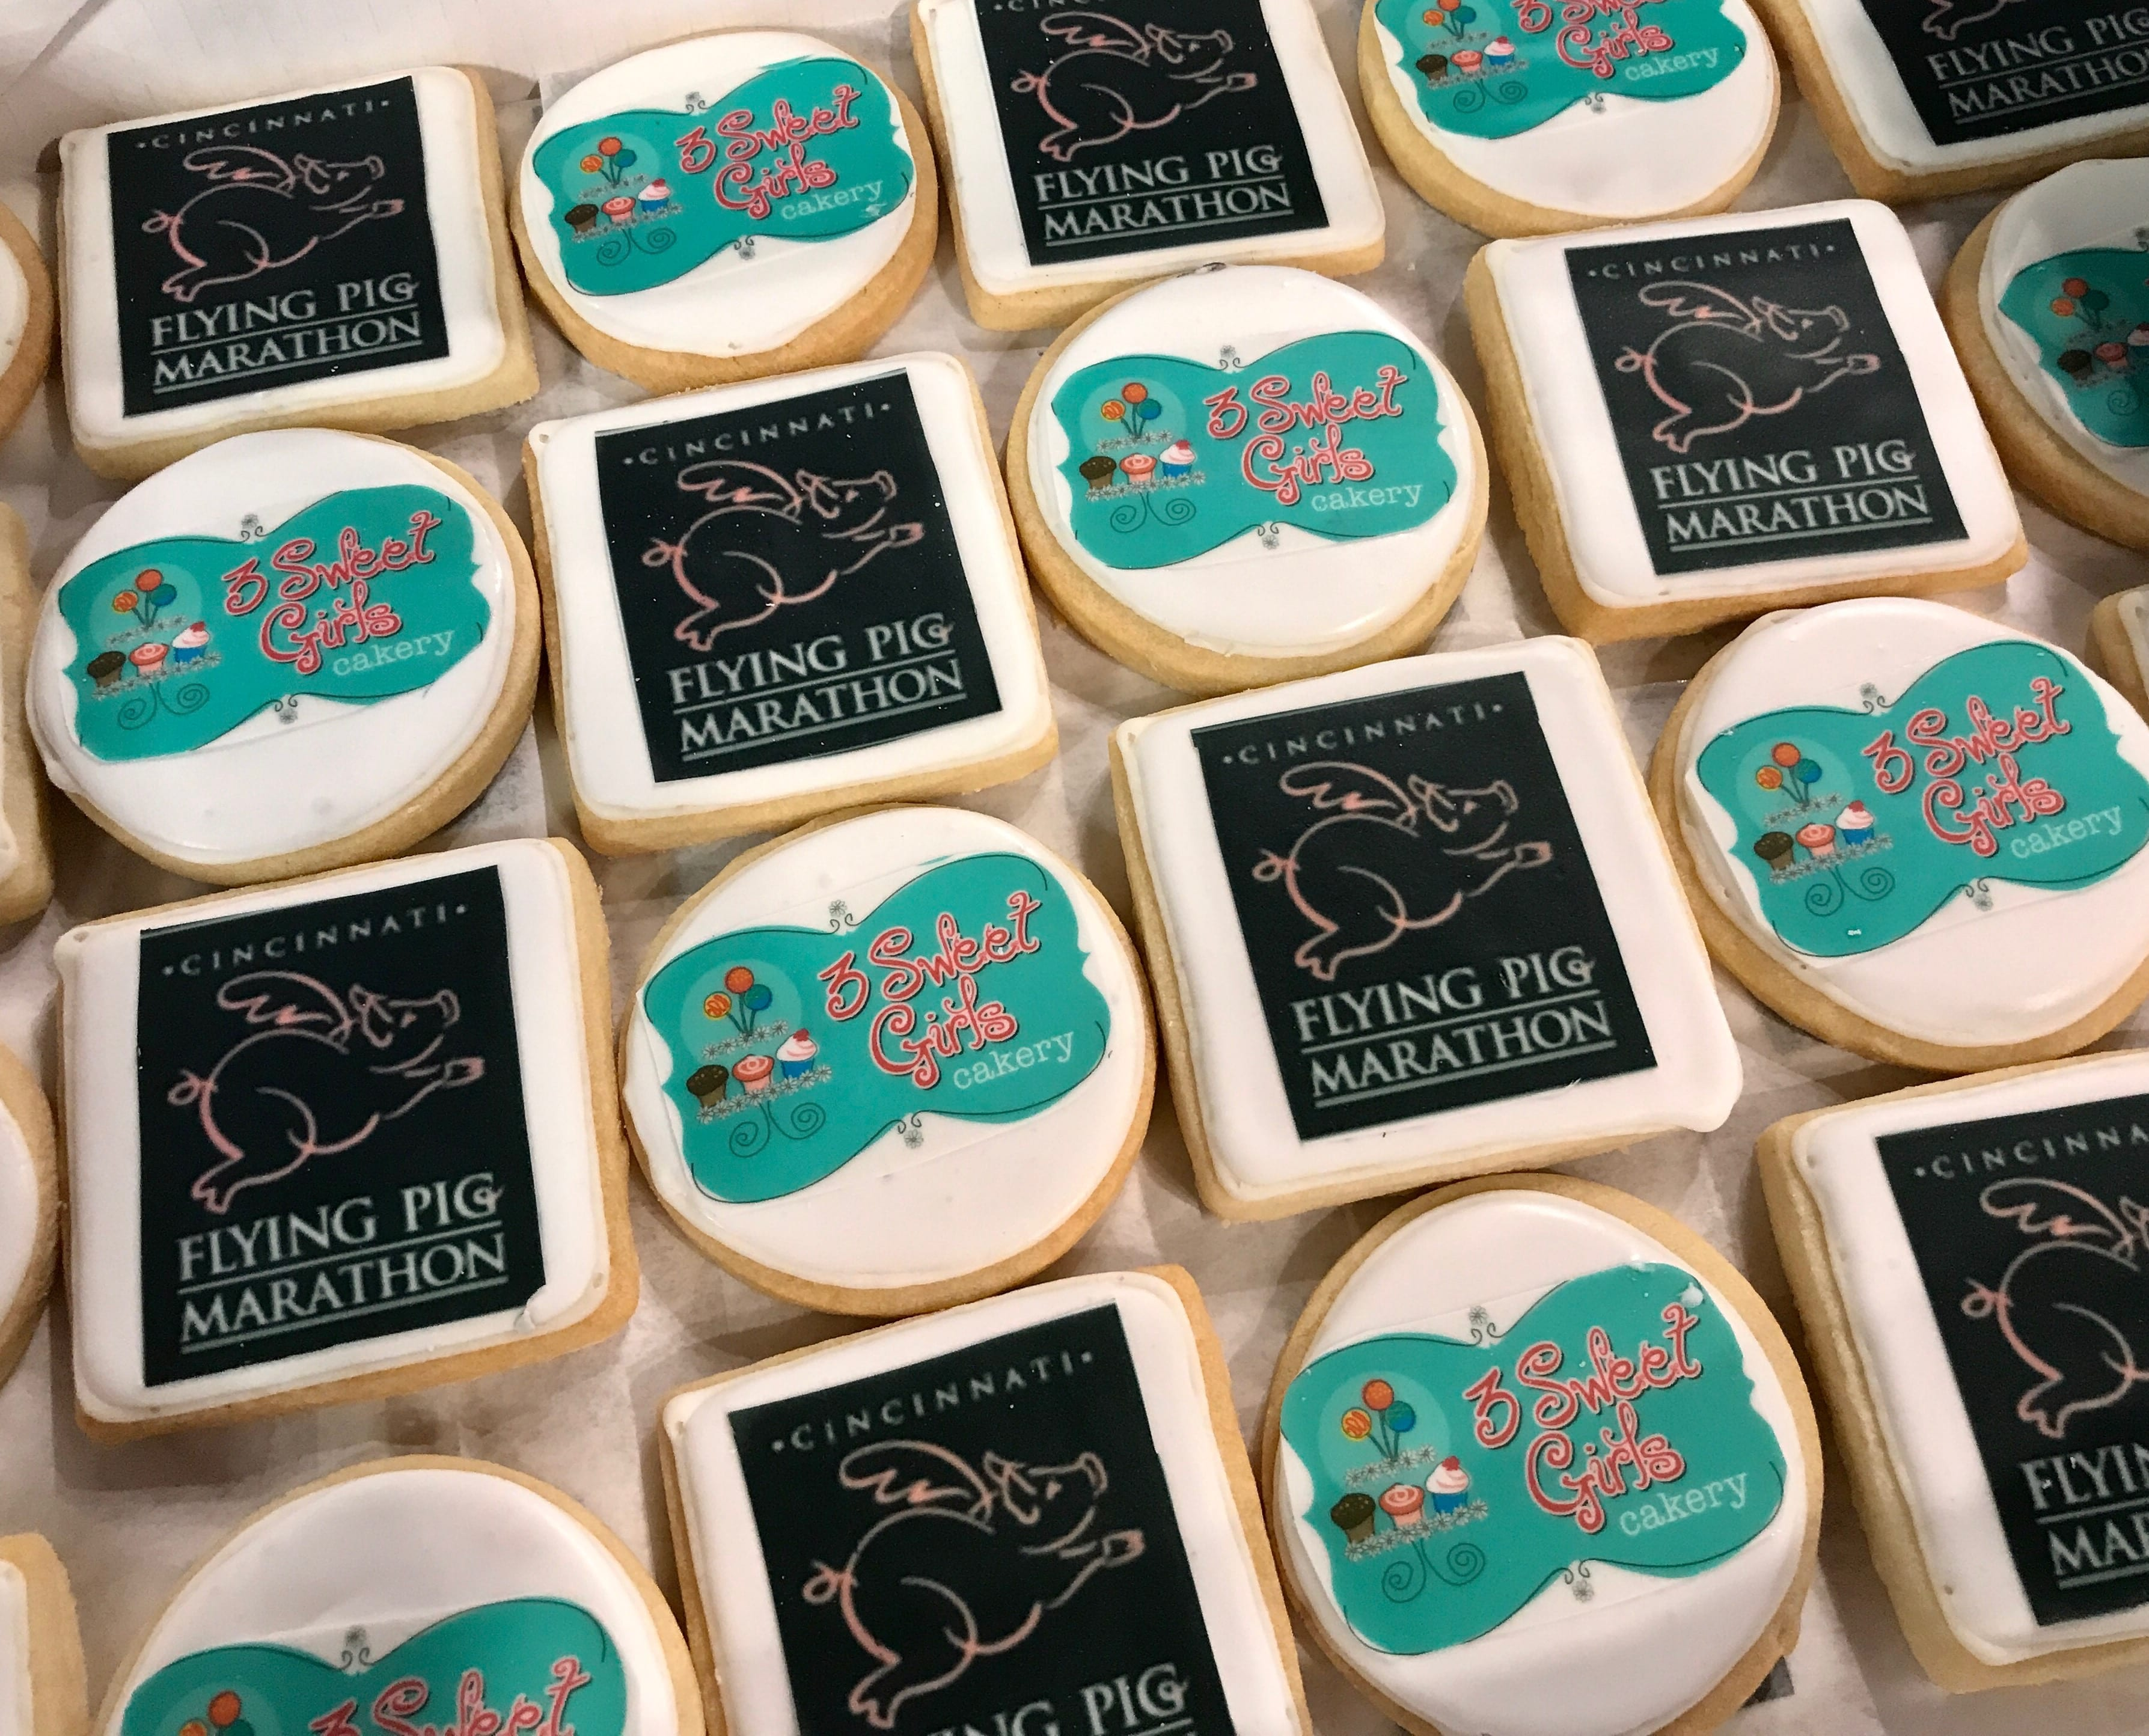 Corporate Logo Cookies for Flying Pig Marathon | 3 Sweet Girls Cakery